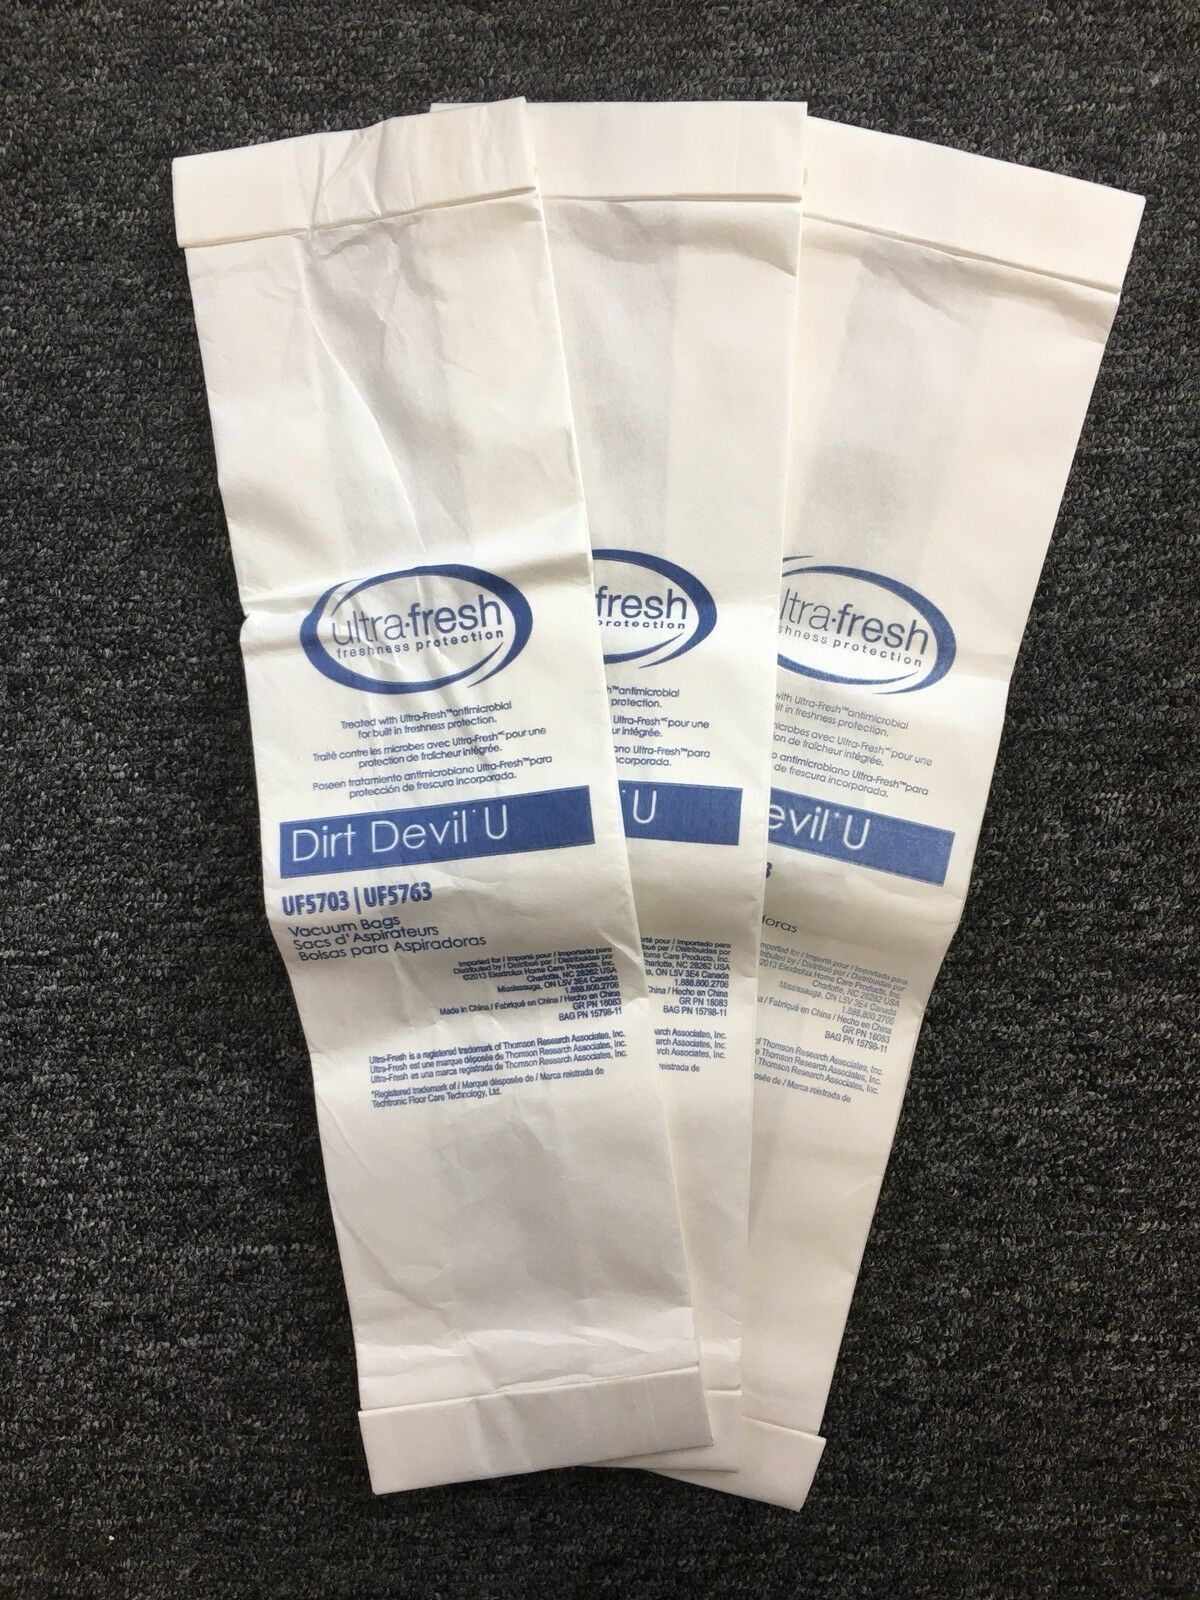 DIRT DEVIL TYPE U 10 Pack VACUUM CLEANER BAGS Swivel Glide Upright 3920048001 image 5